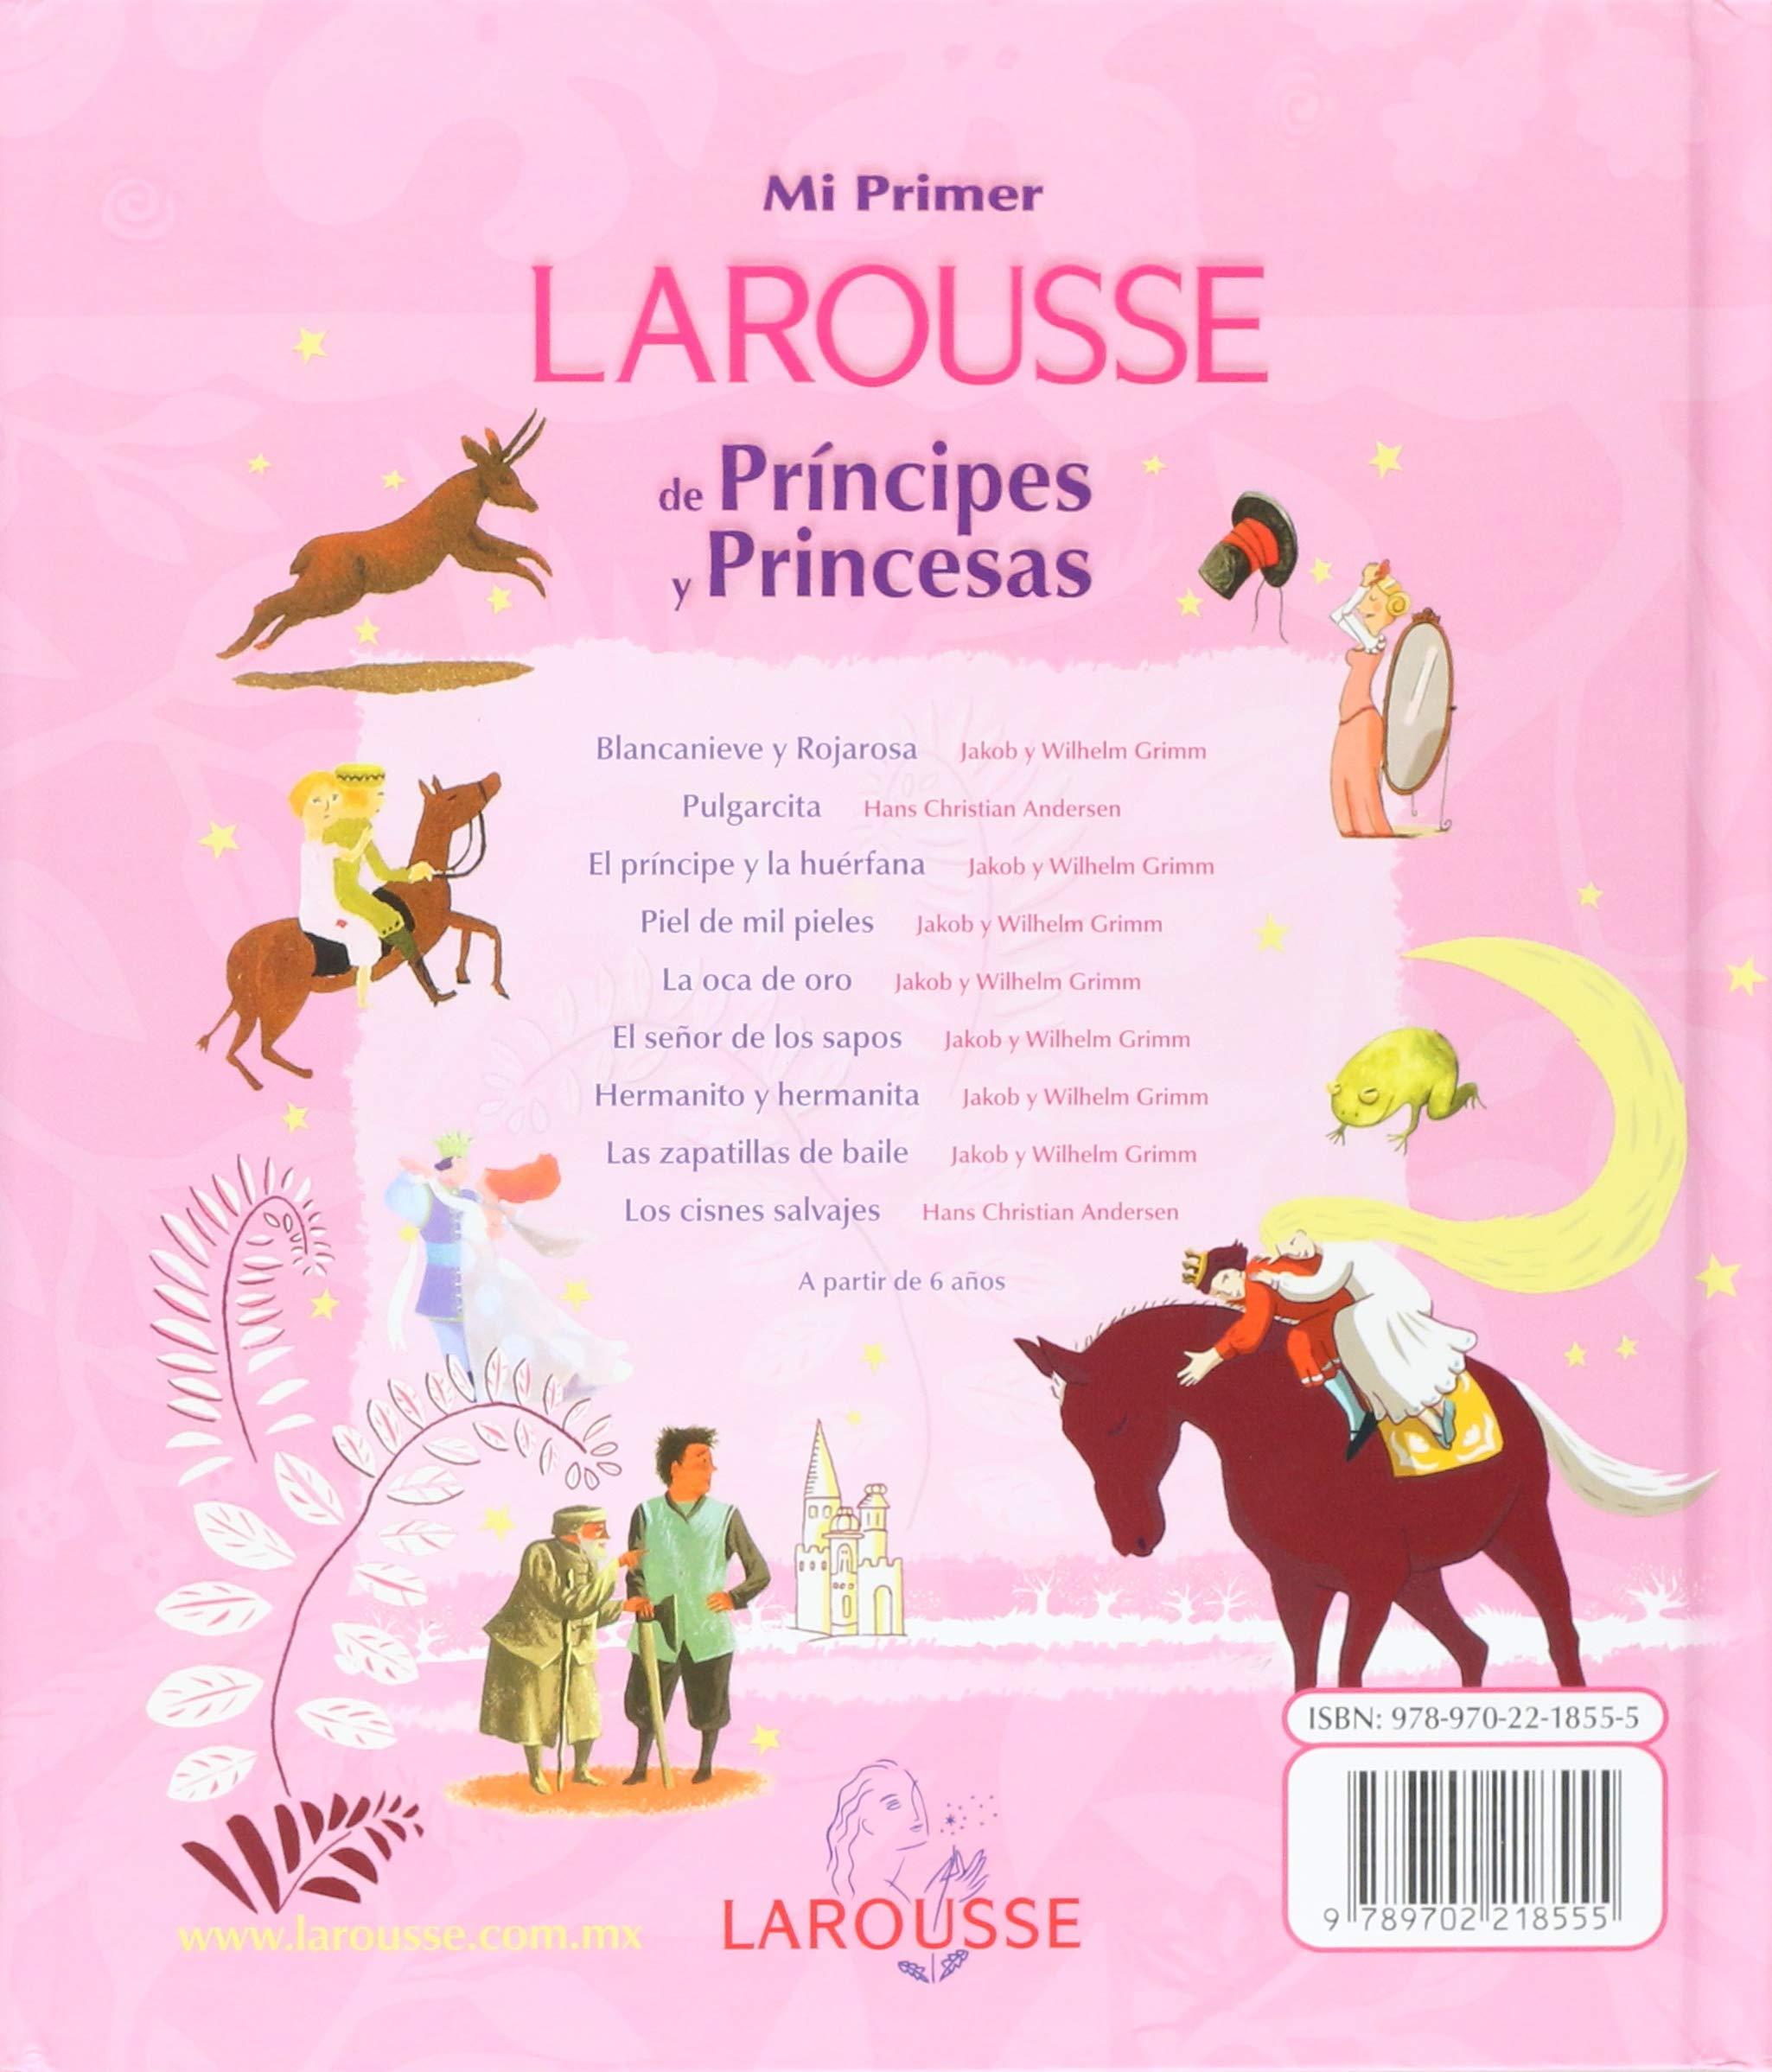 Mi primer Larousse de principes y princesas/ My First Larousse of Princes and Princesses (Spanish Edition): Tomas Garcia: 9789702218555: Amazon.com: Books